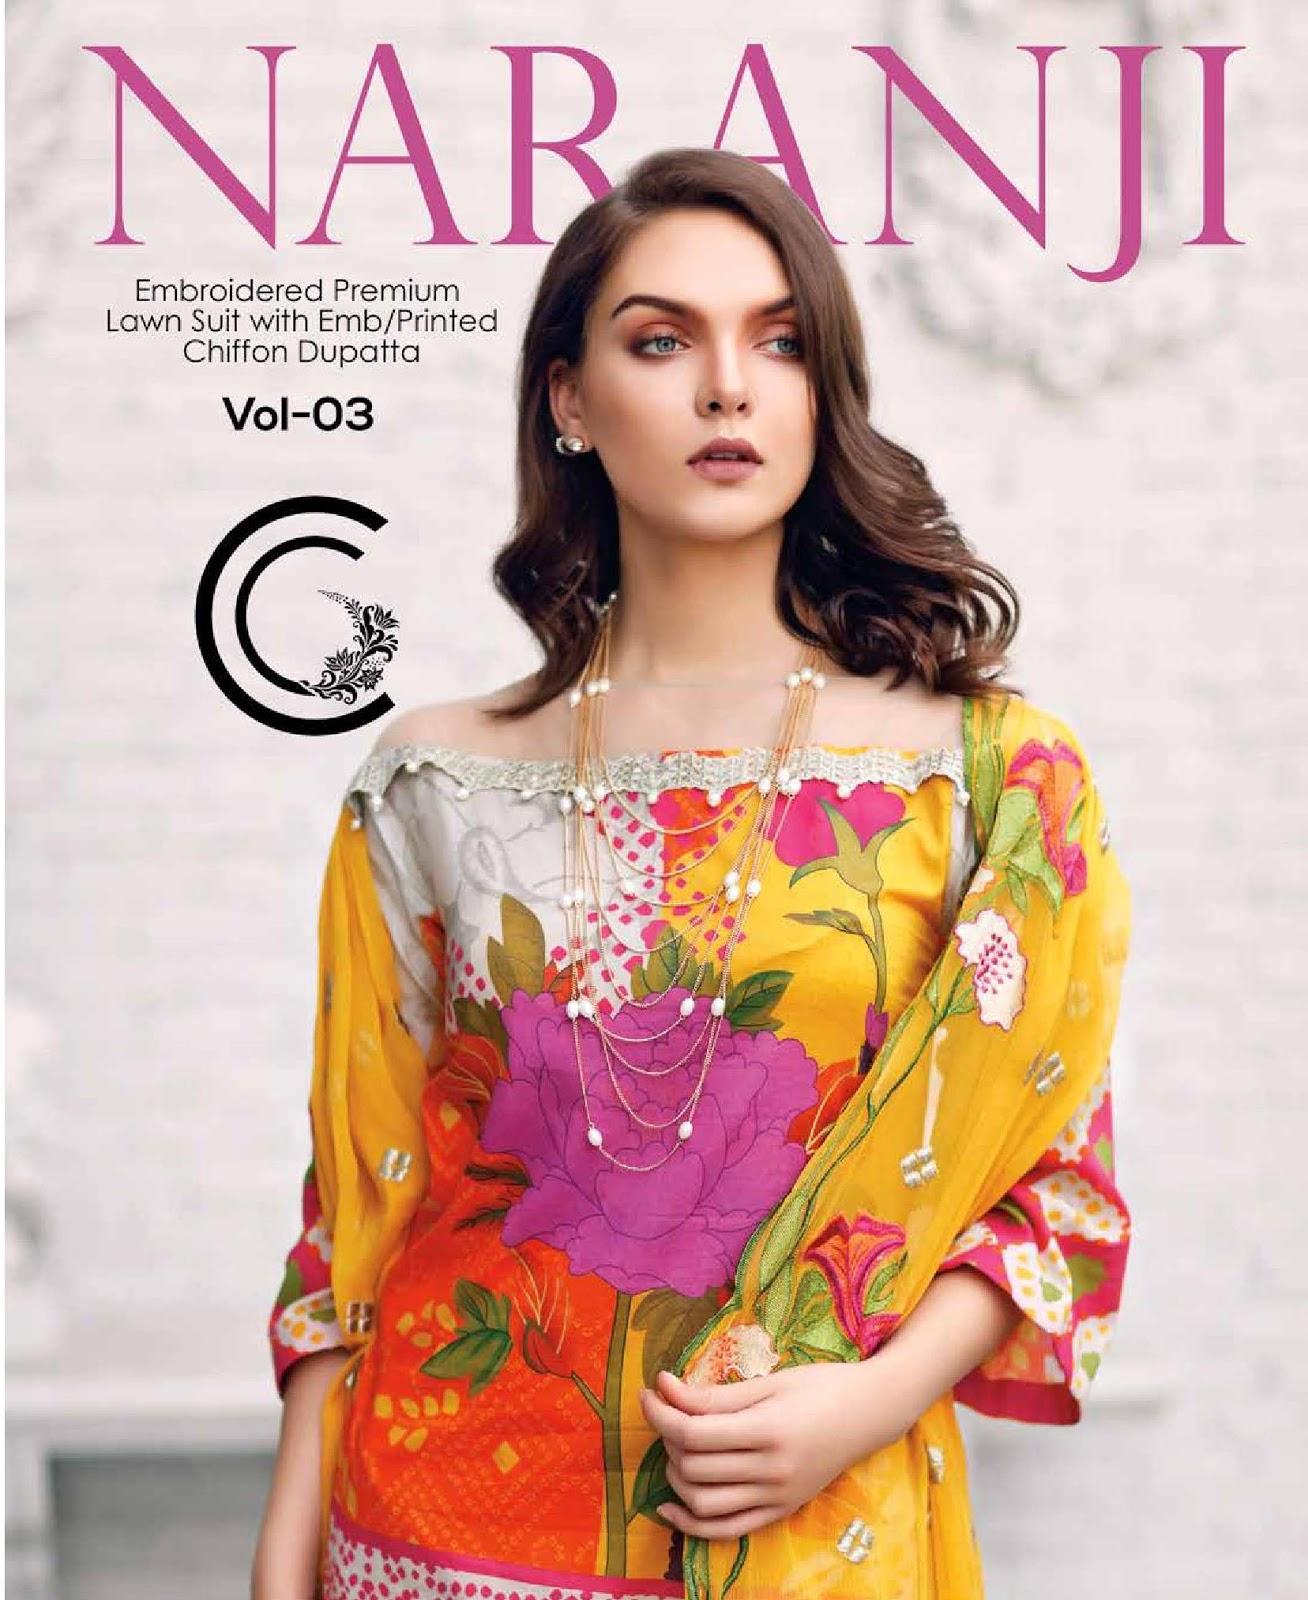 681a8a386b 4Seasons Fashion: Charizma Naranji Premium Embroidered Lawn ...